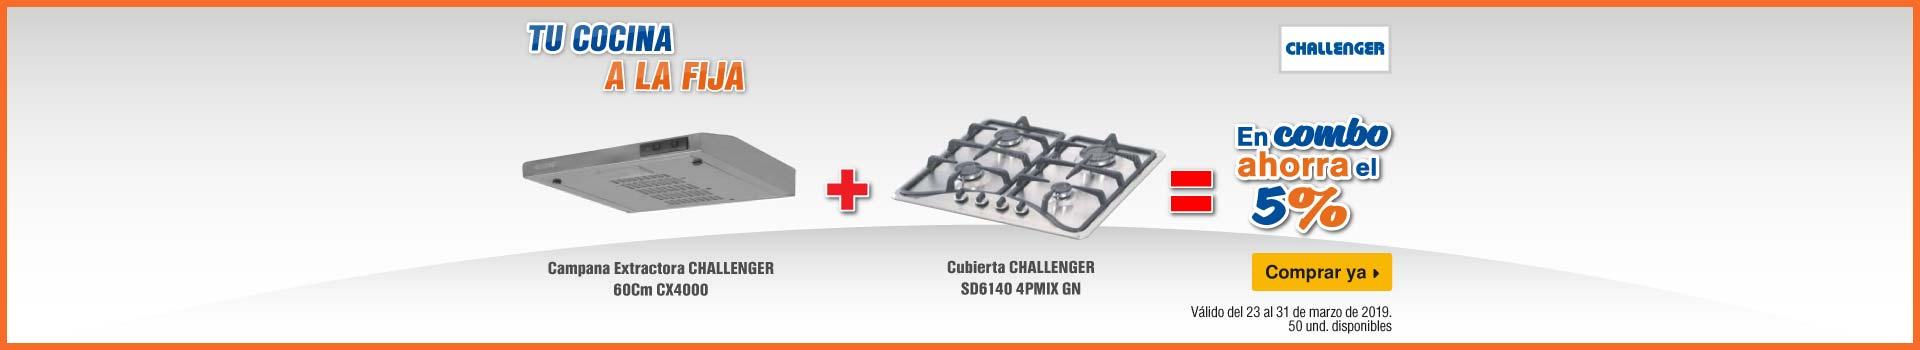 AK-KT-mayores-3-ELECT-BCAT-cocina-challenger-230319